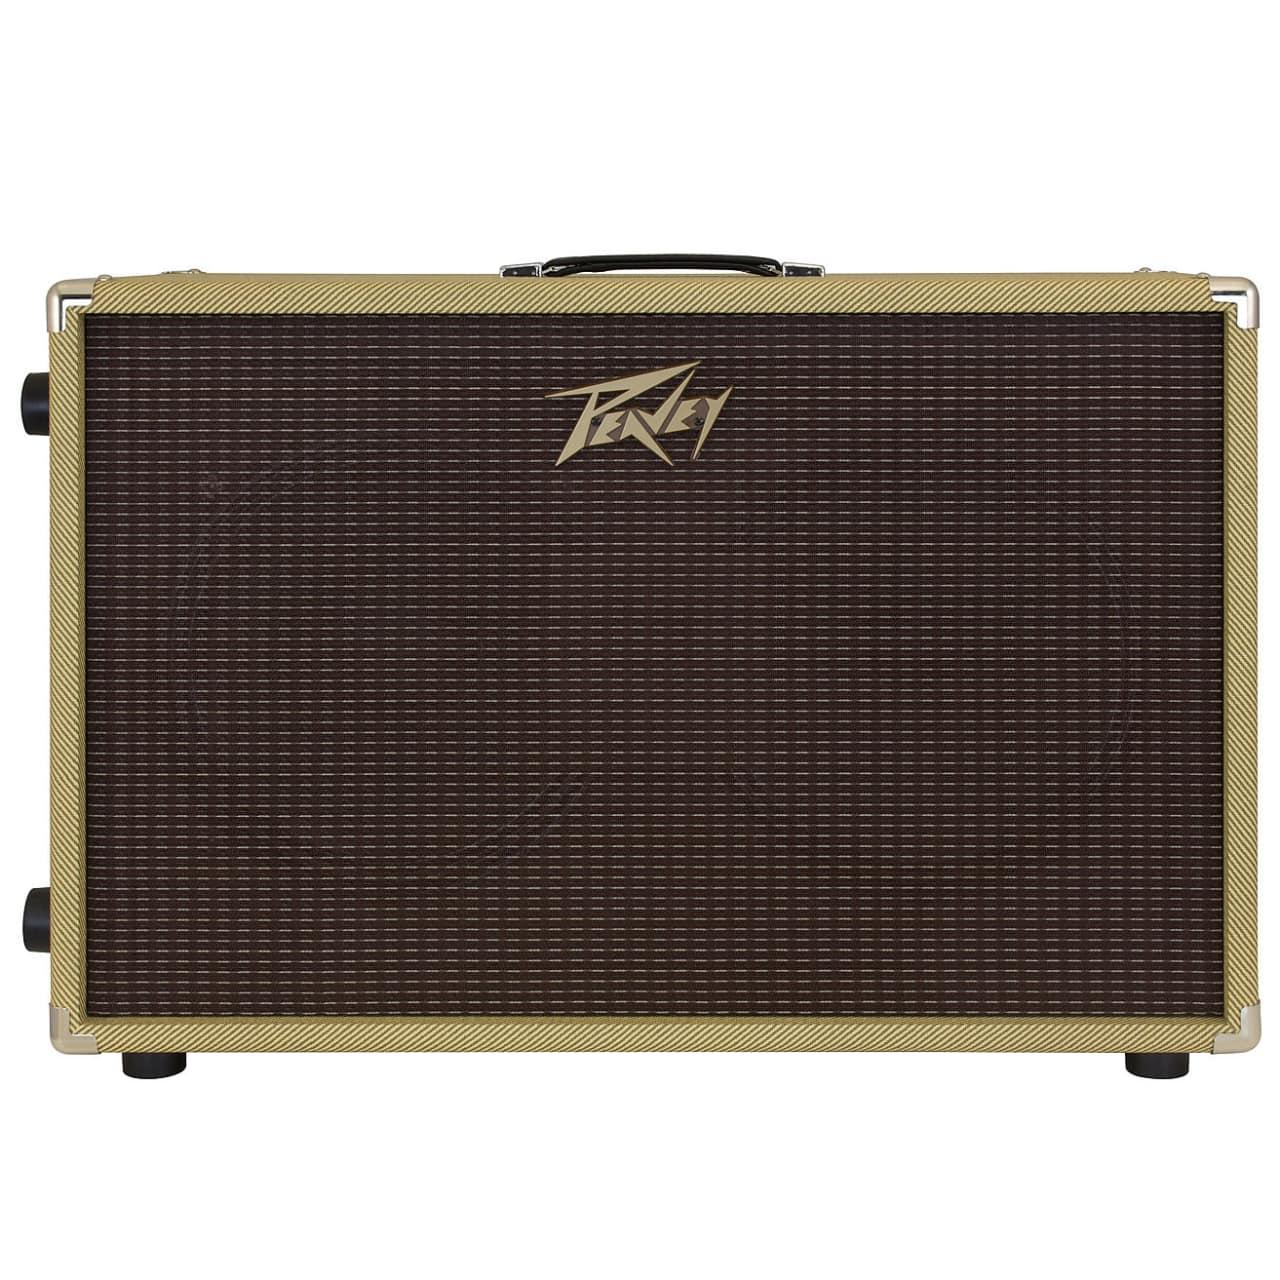 peavey 212 c guitar speaker cabinet 120 watts 2x12 reverb. Black Bedroom Furniture Sets. Home Design Ideas